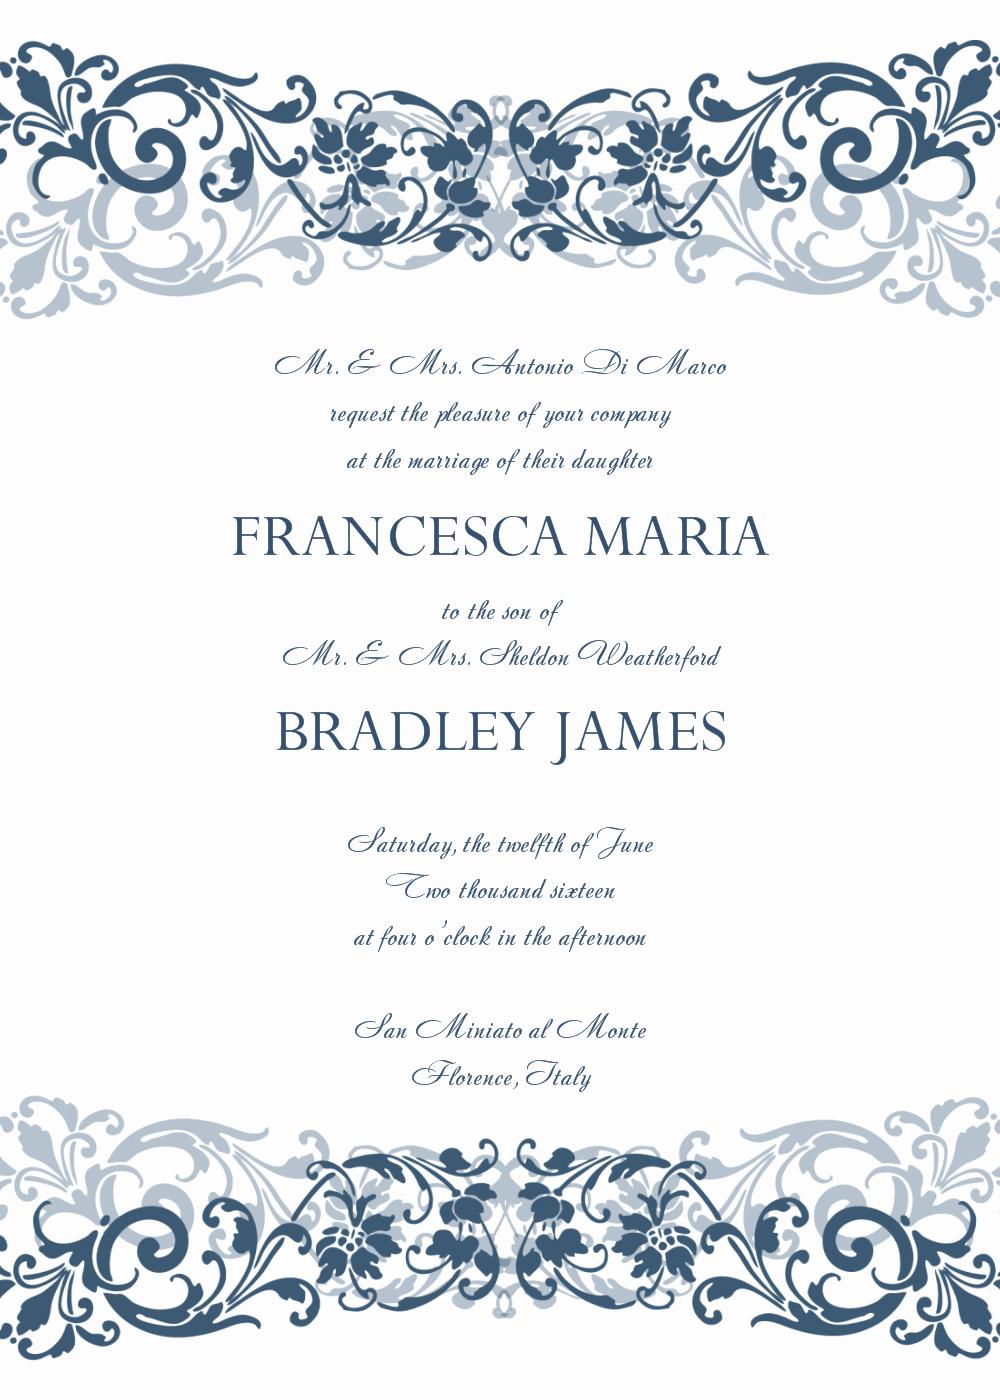 Wedding Invitation Template Microsoft Word New 8 Free Wedding Invitation Templates Excel Pdf formats